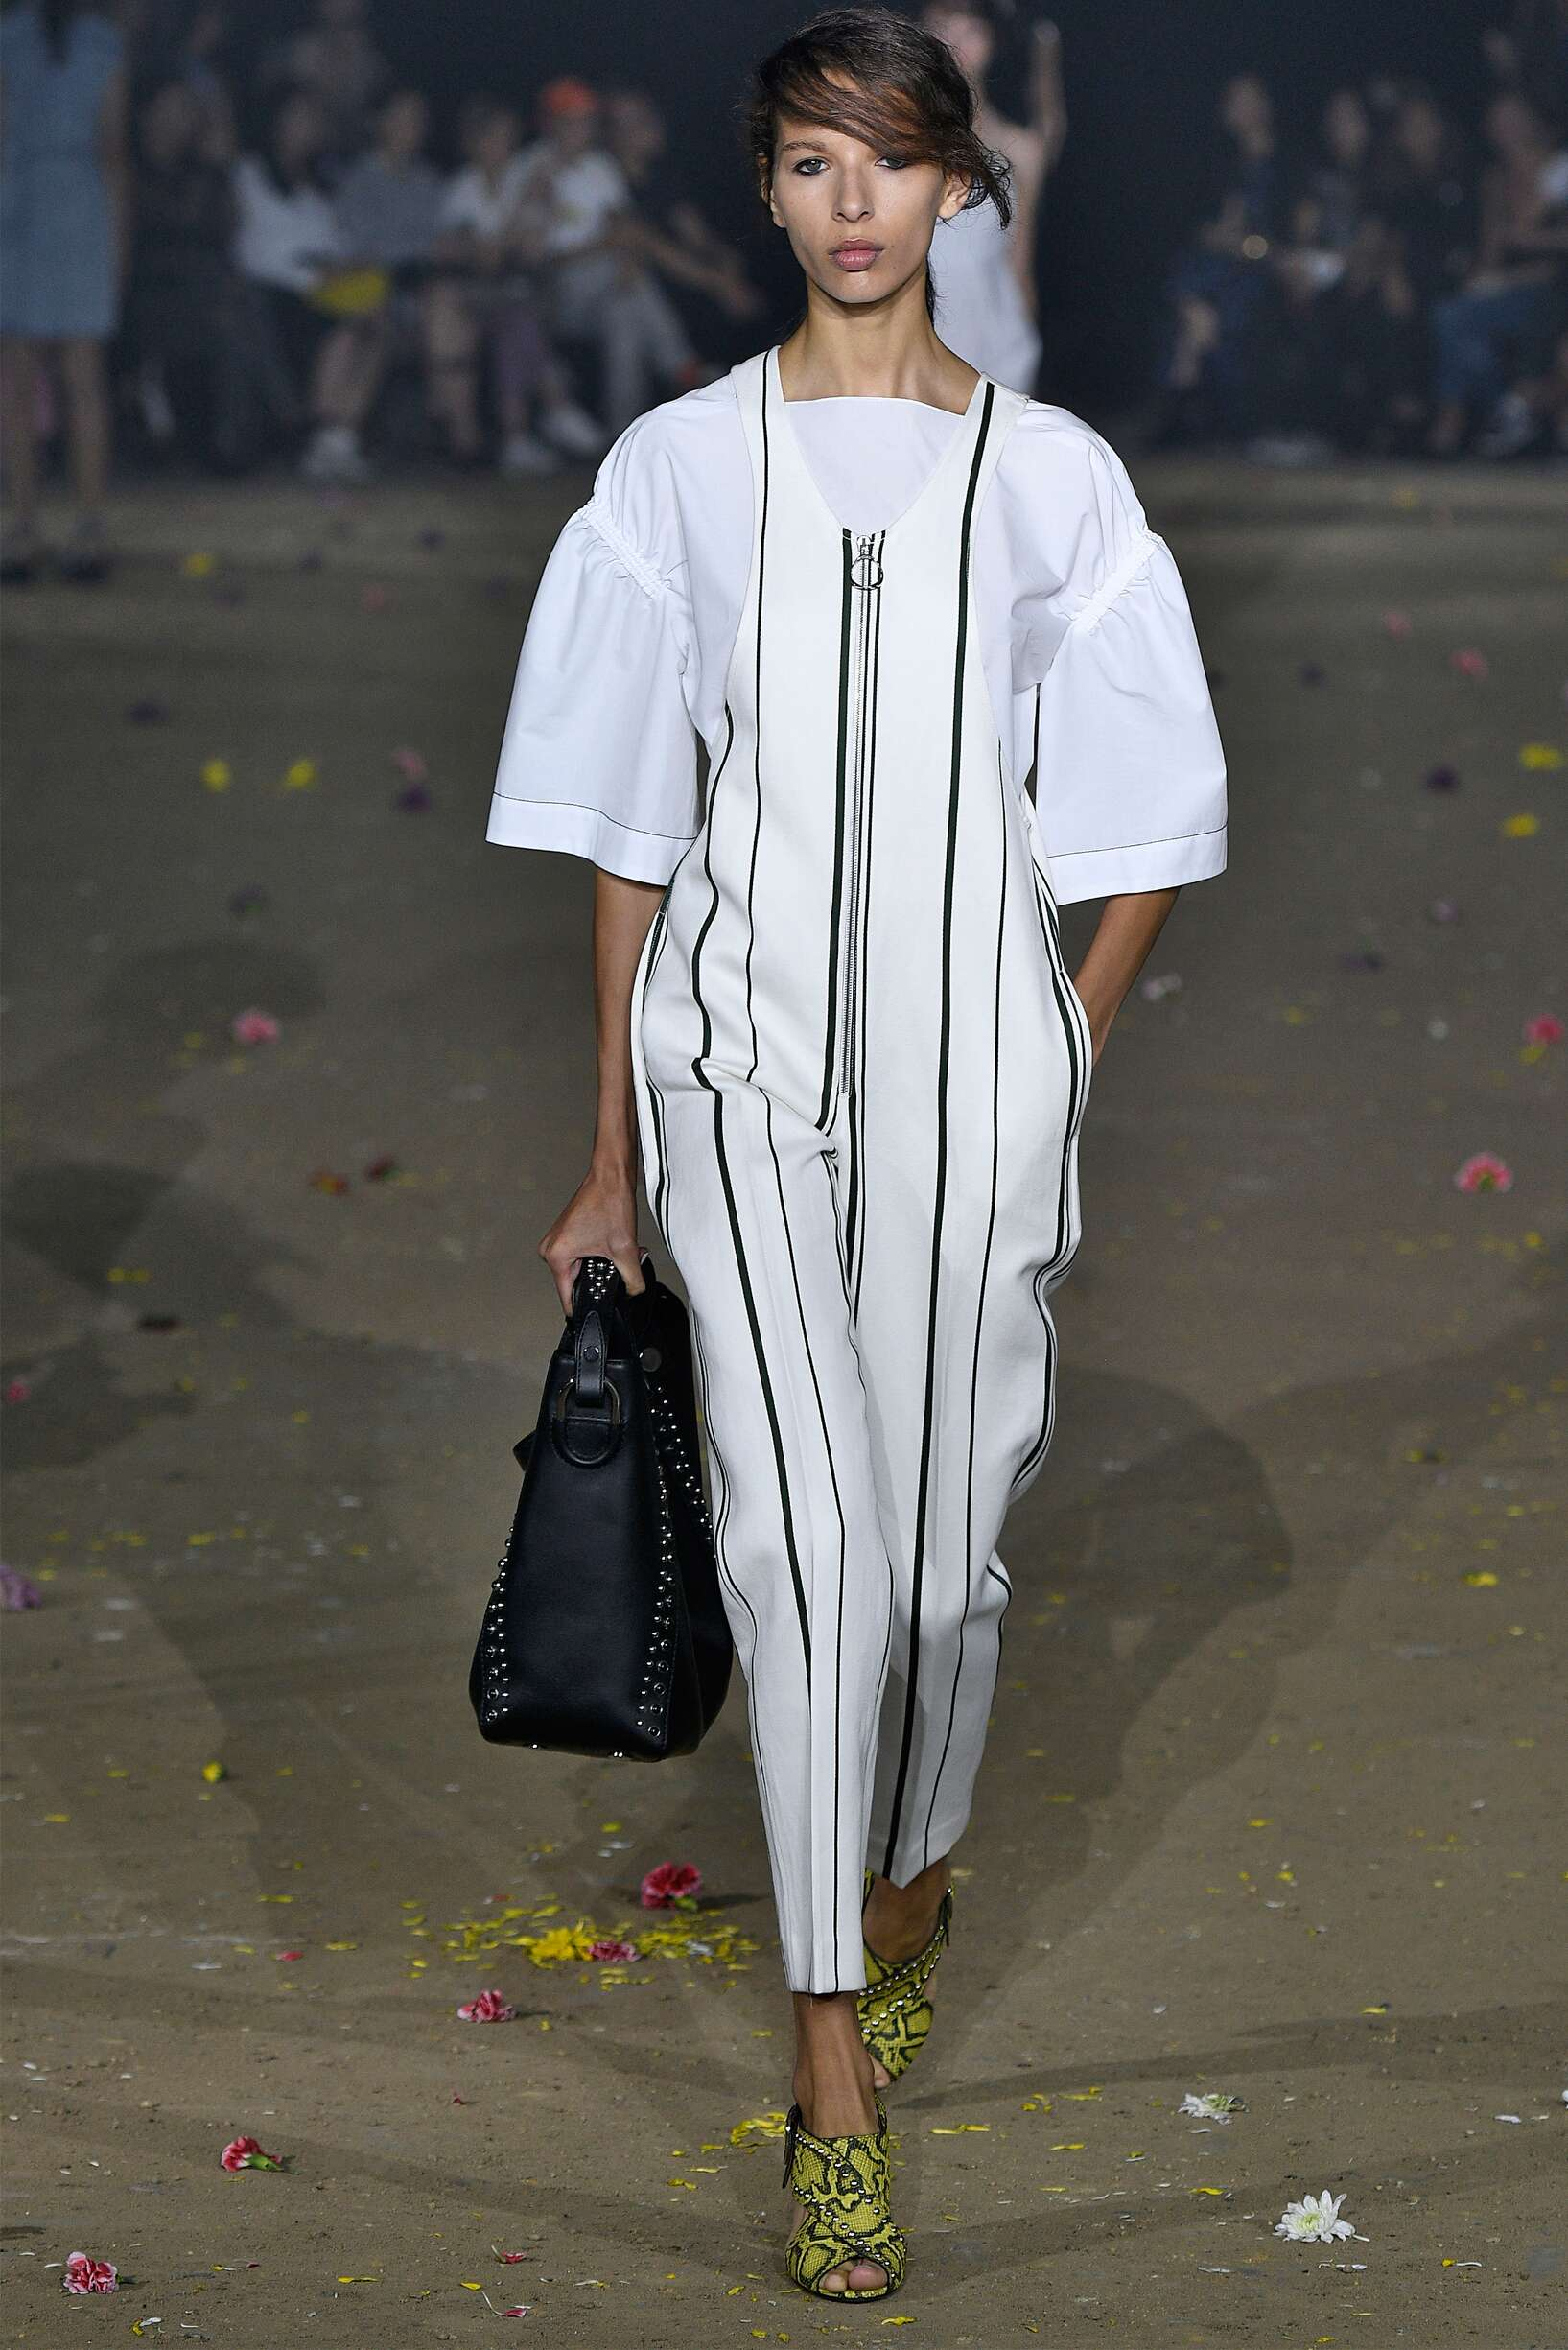 2017 Catwalk 3.1 Phillip Lim Woman Fashion Show Summer